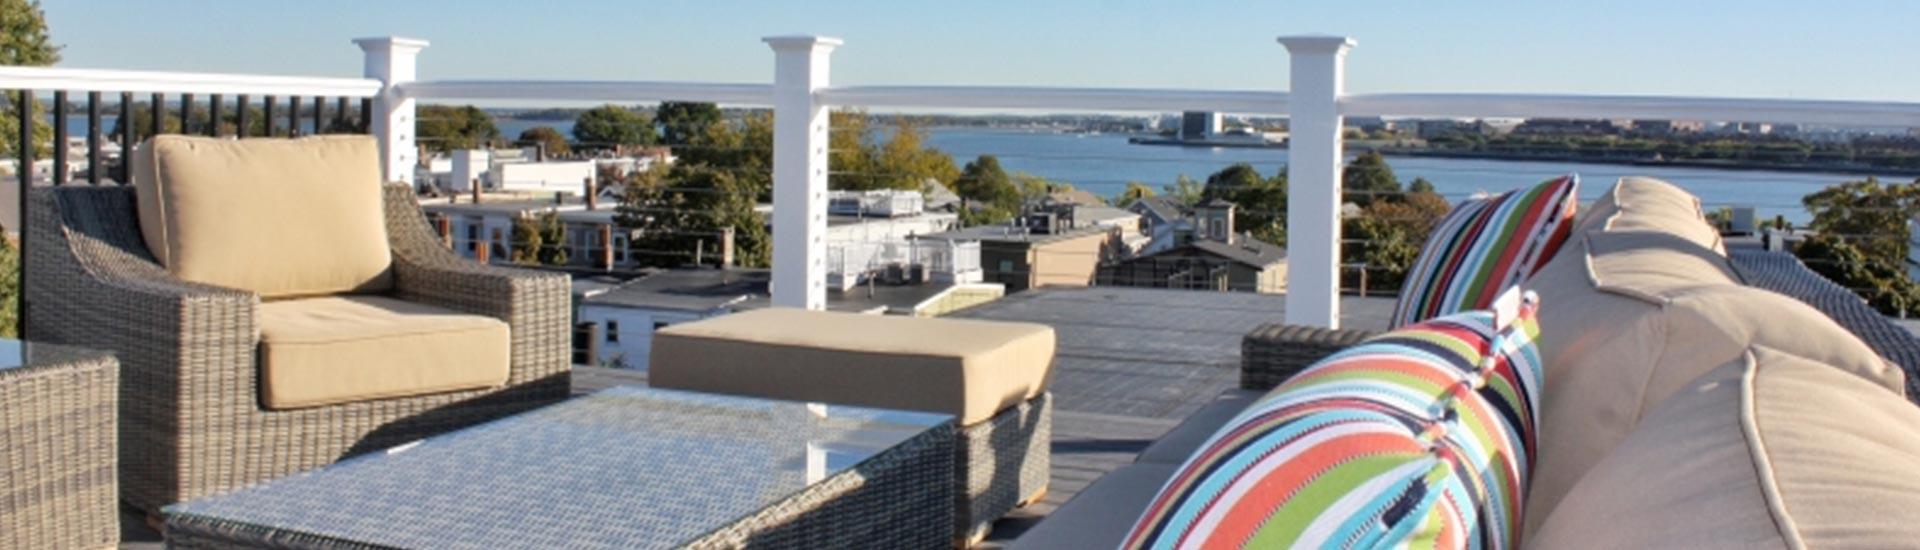 roof-deck-10